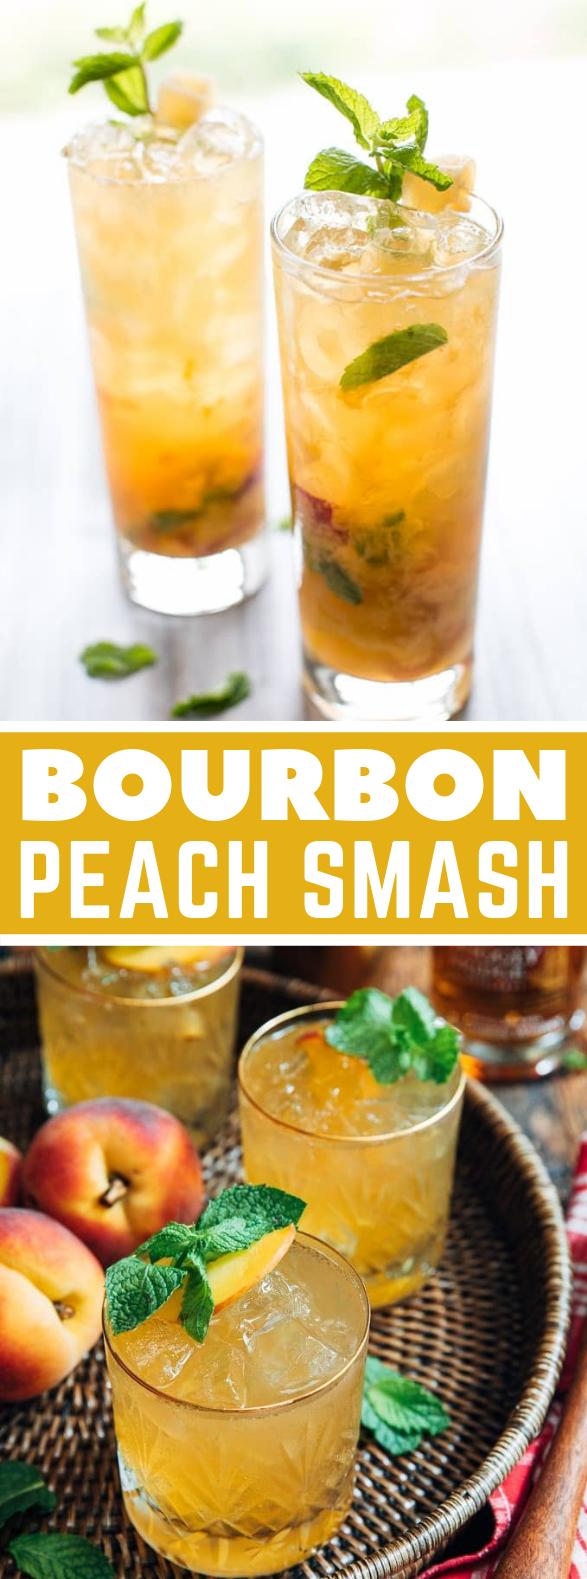 BOURBON PEACH SMASH #drinks #nonalcoholic